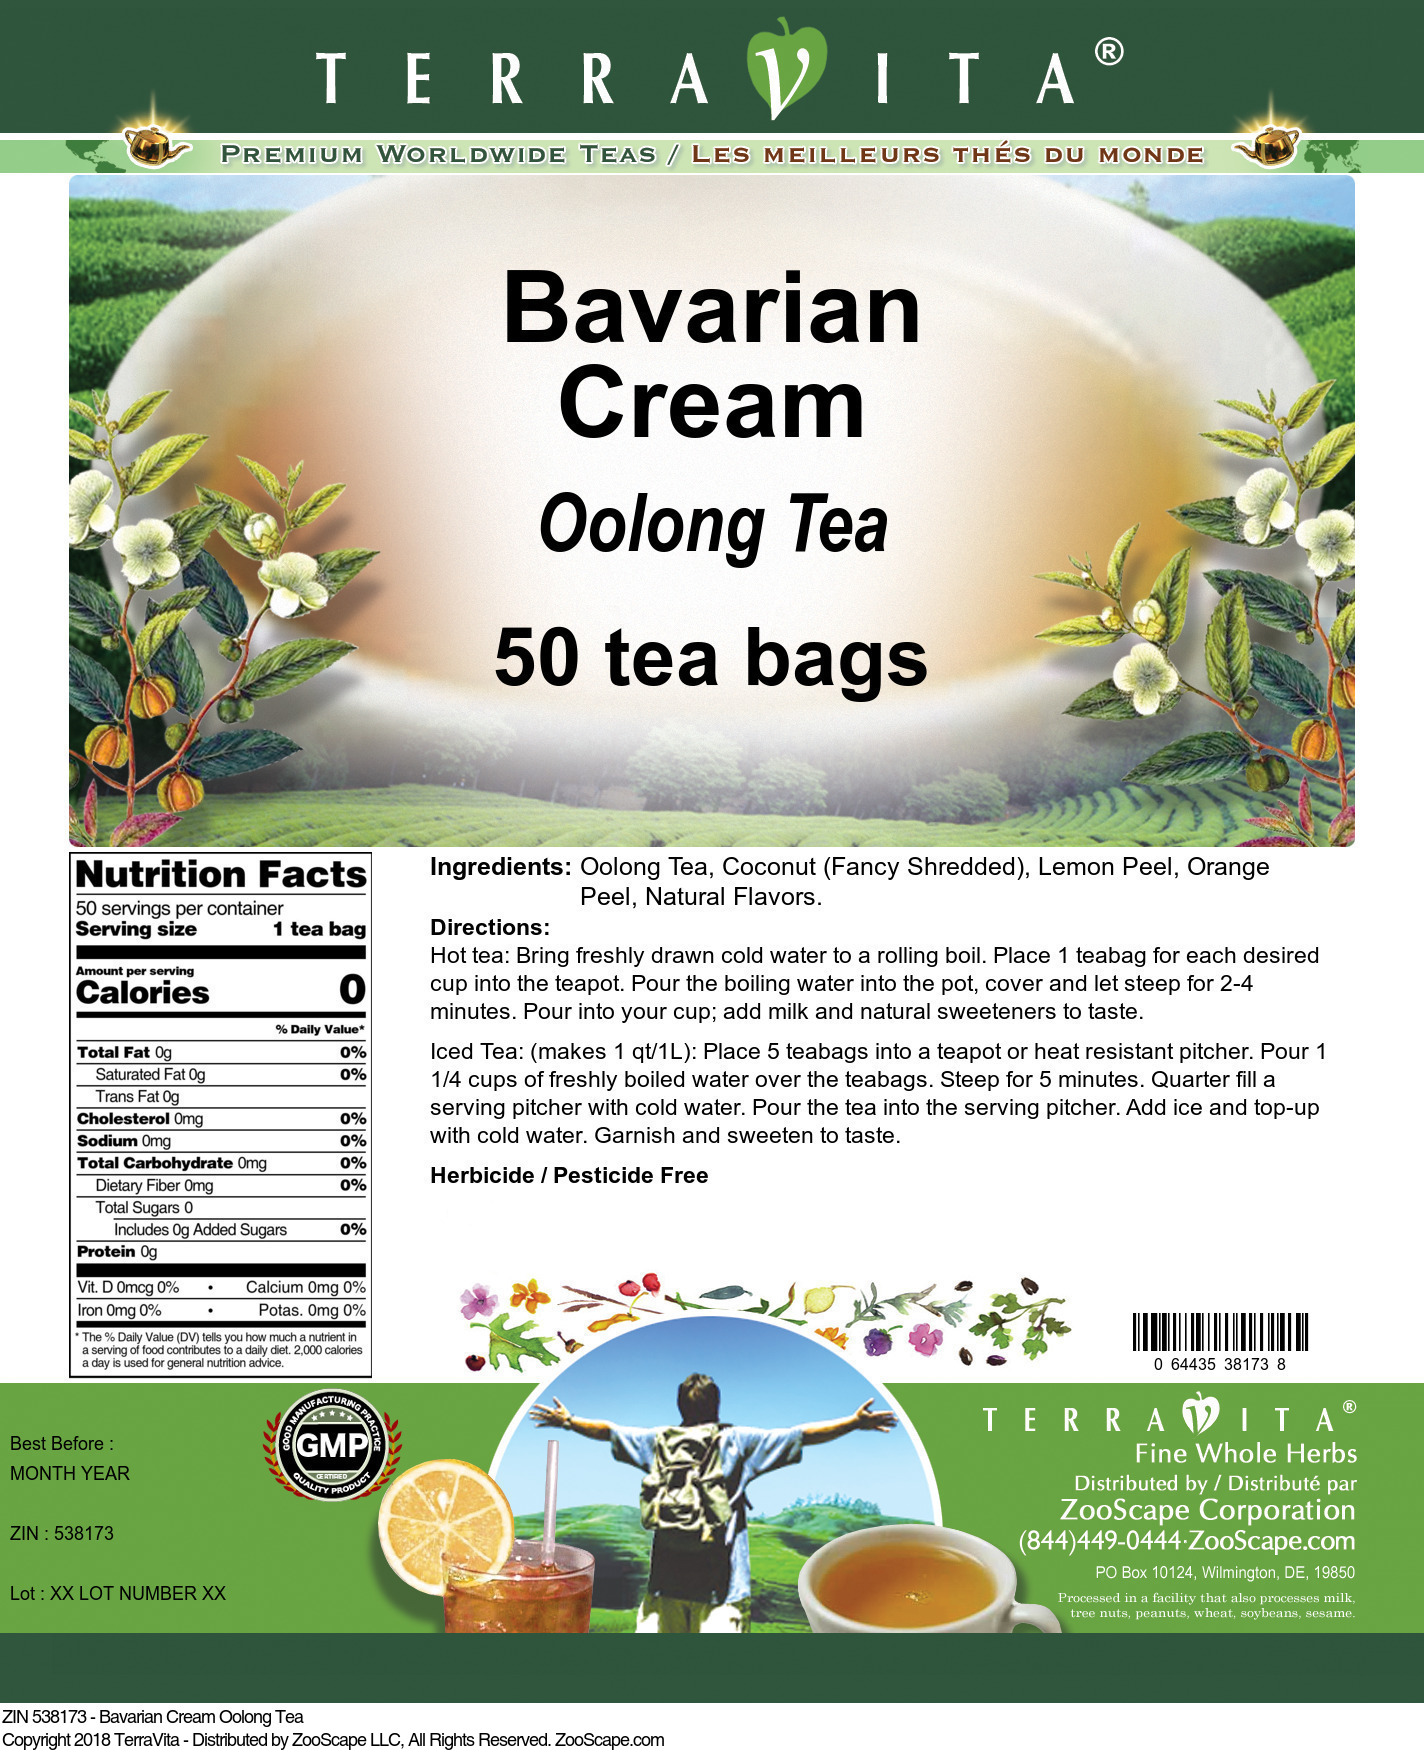 Bavarian Cream Oolong Tea